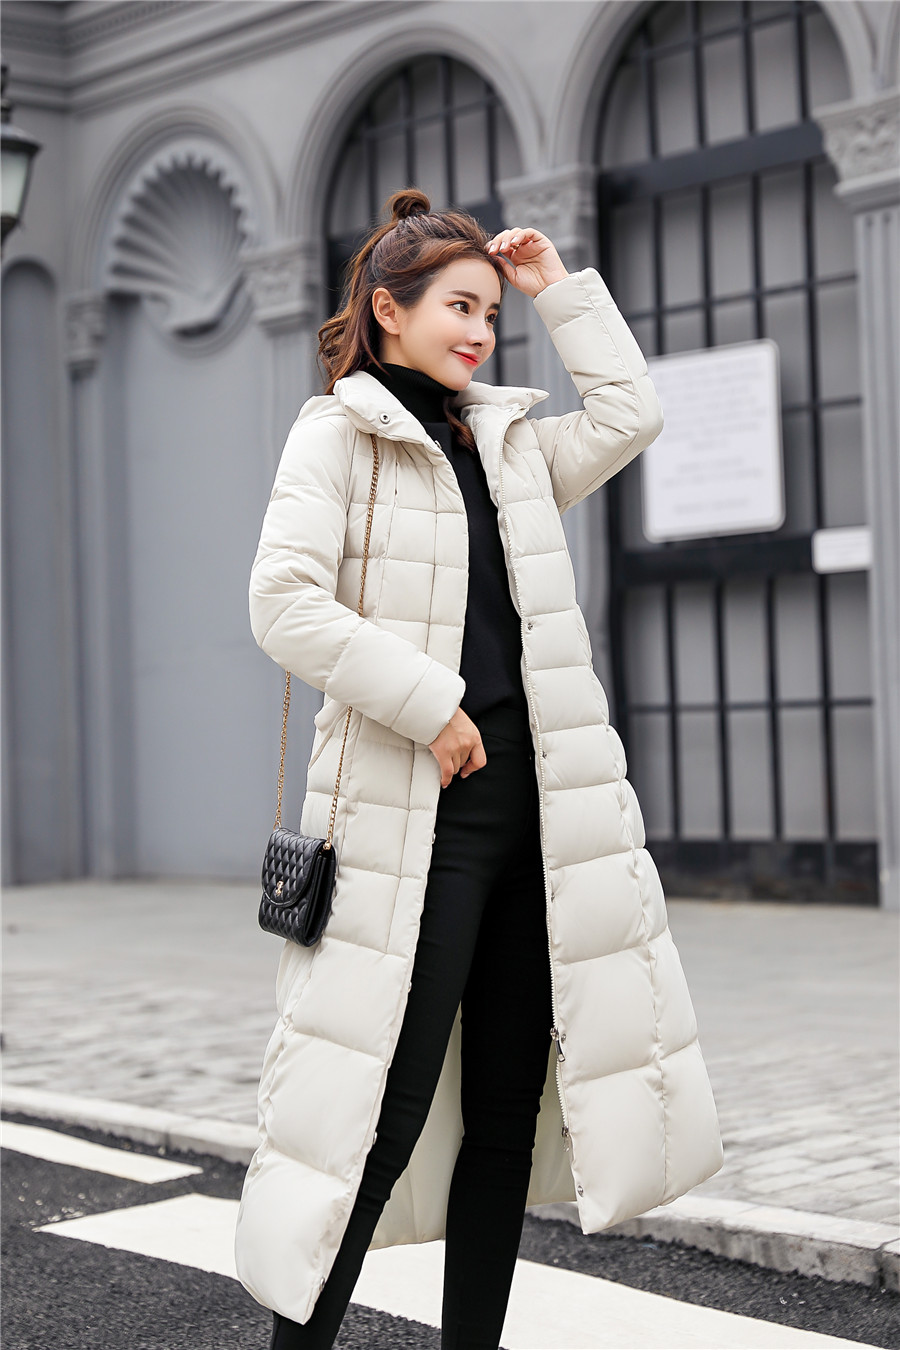 Down Coat Women Long Fur Collar Jacket Women Winter With Hooded Down Coat Winter Oversize Doudoune Jacket Coat Lady Down Parka